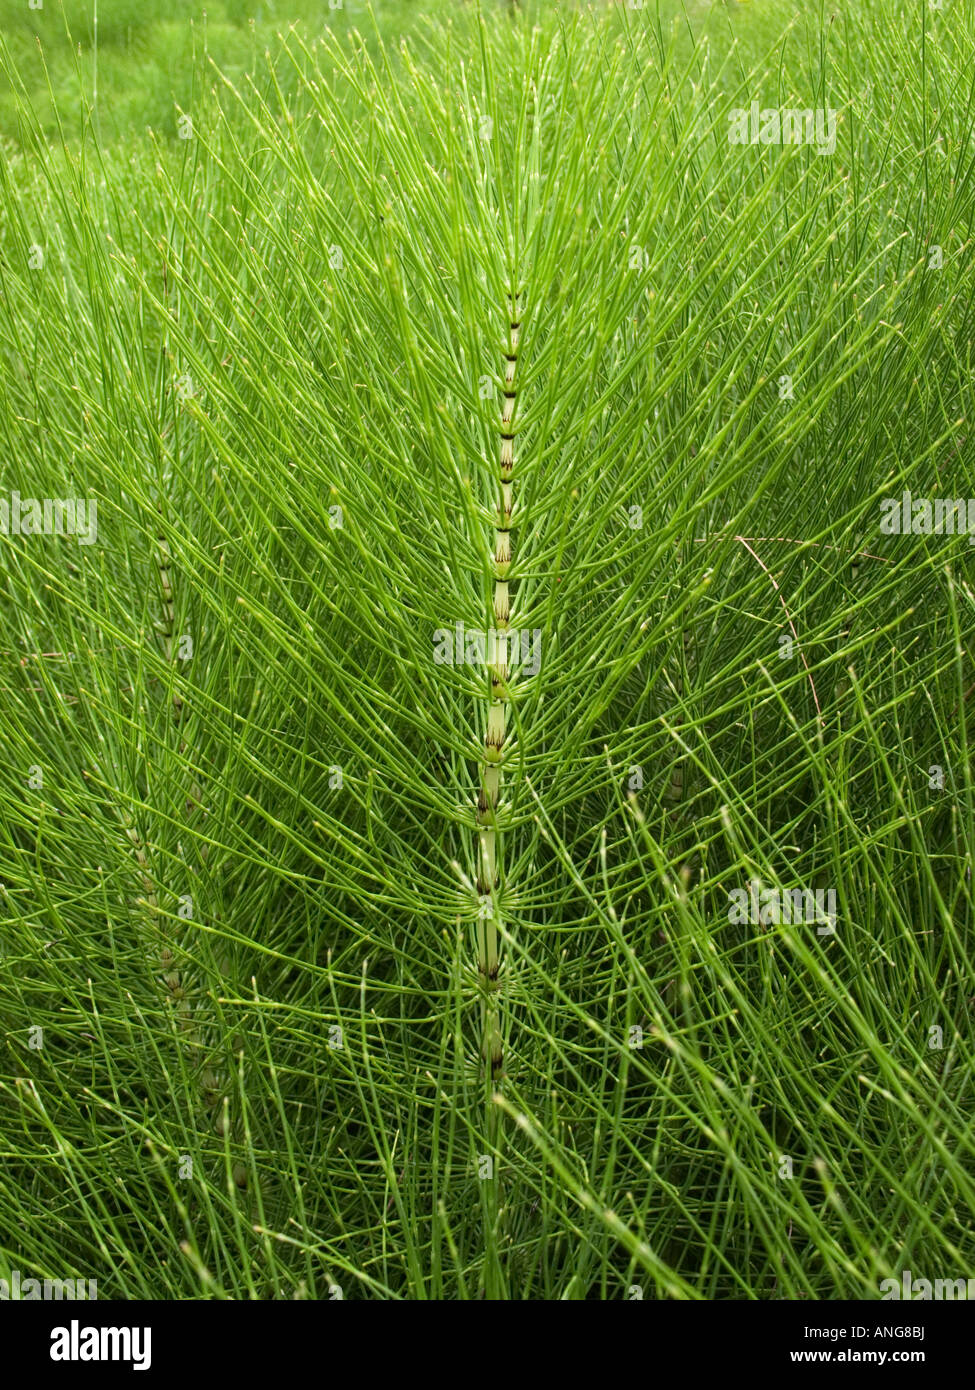 Vista de cerca de una masa de plantas Equiseto o cola de caballo equisetum arvense Foto de stock